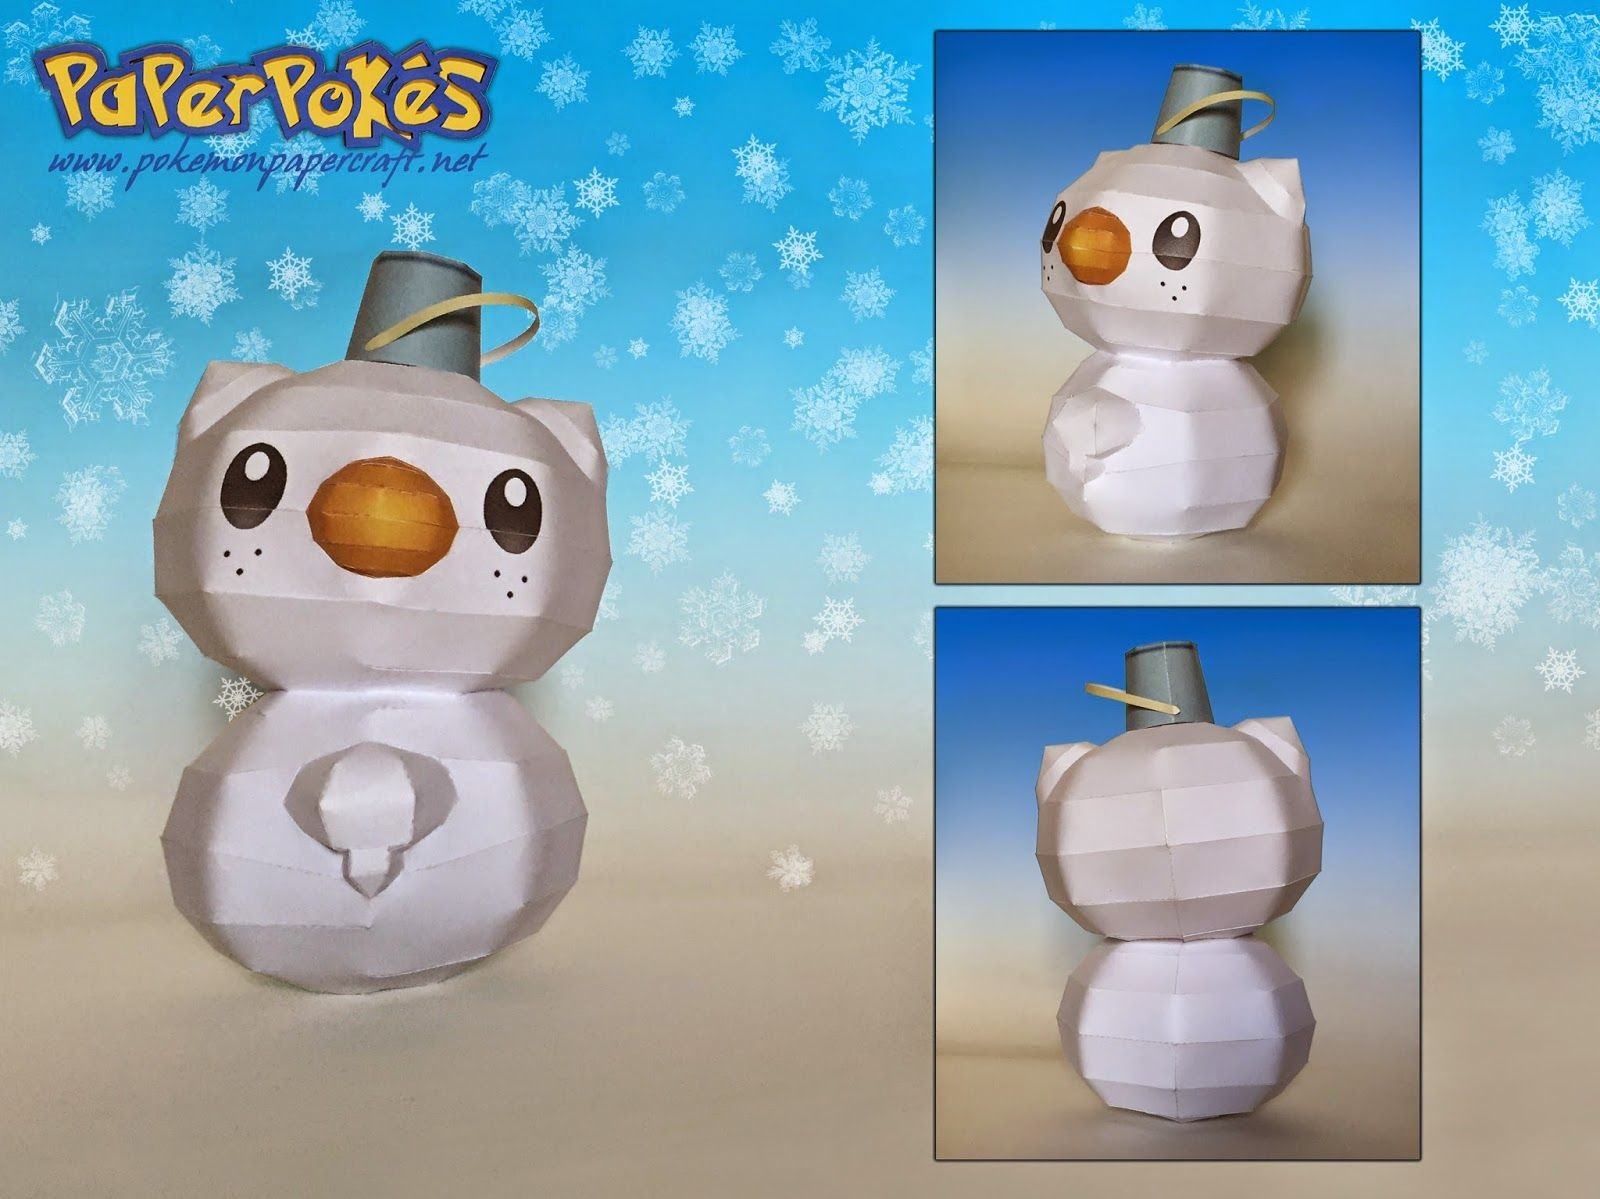 Papercraft Snowman Paperpokés Pokémon Papercrafts Snowshawott